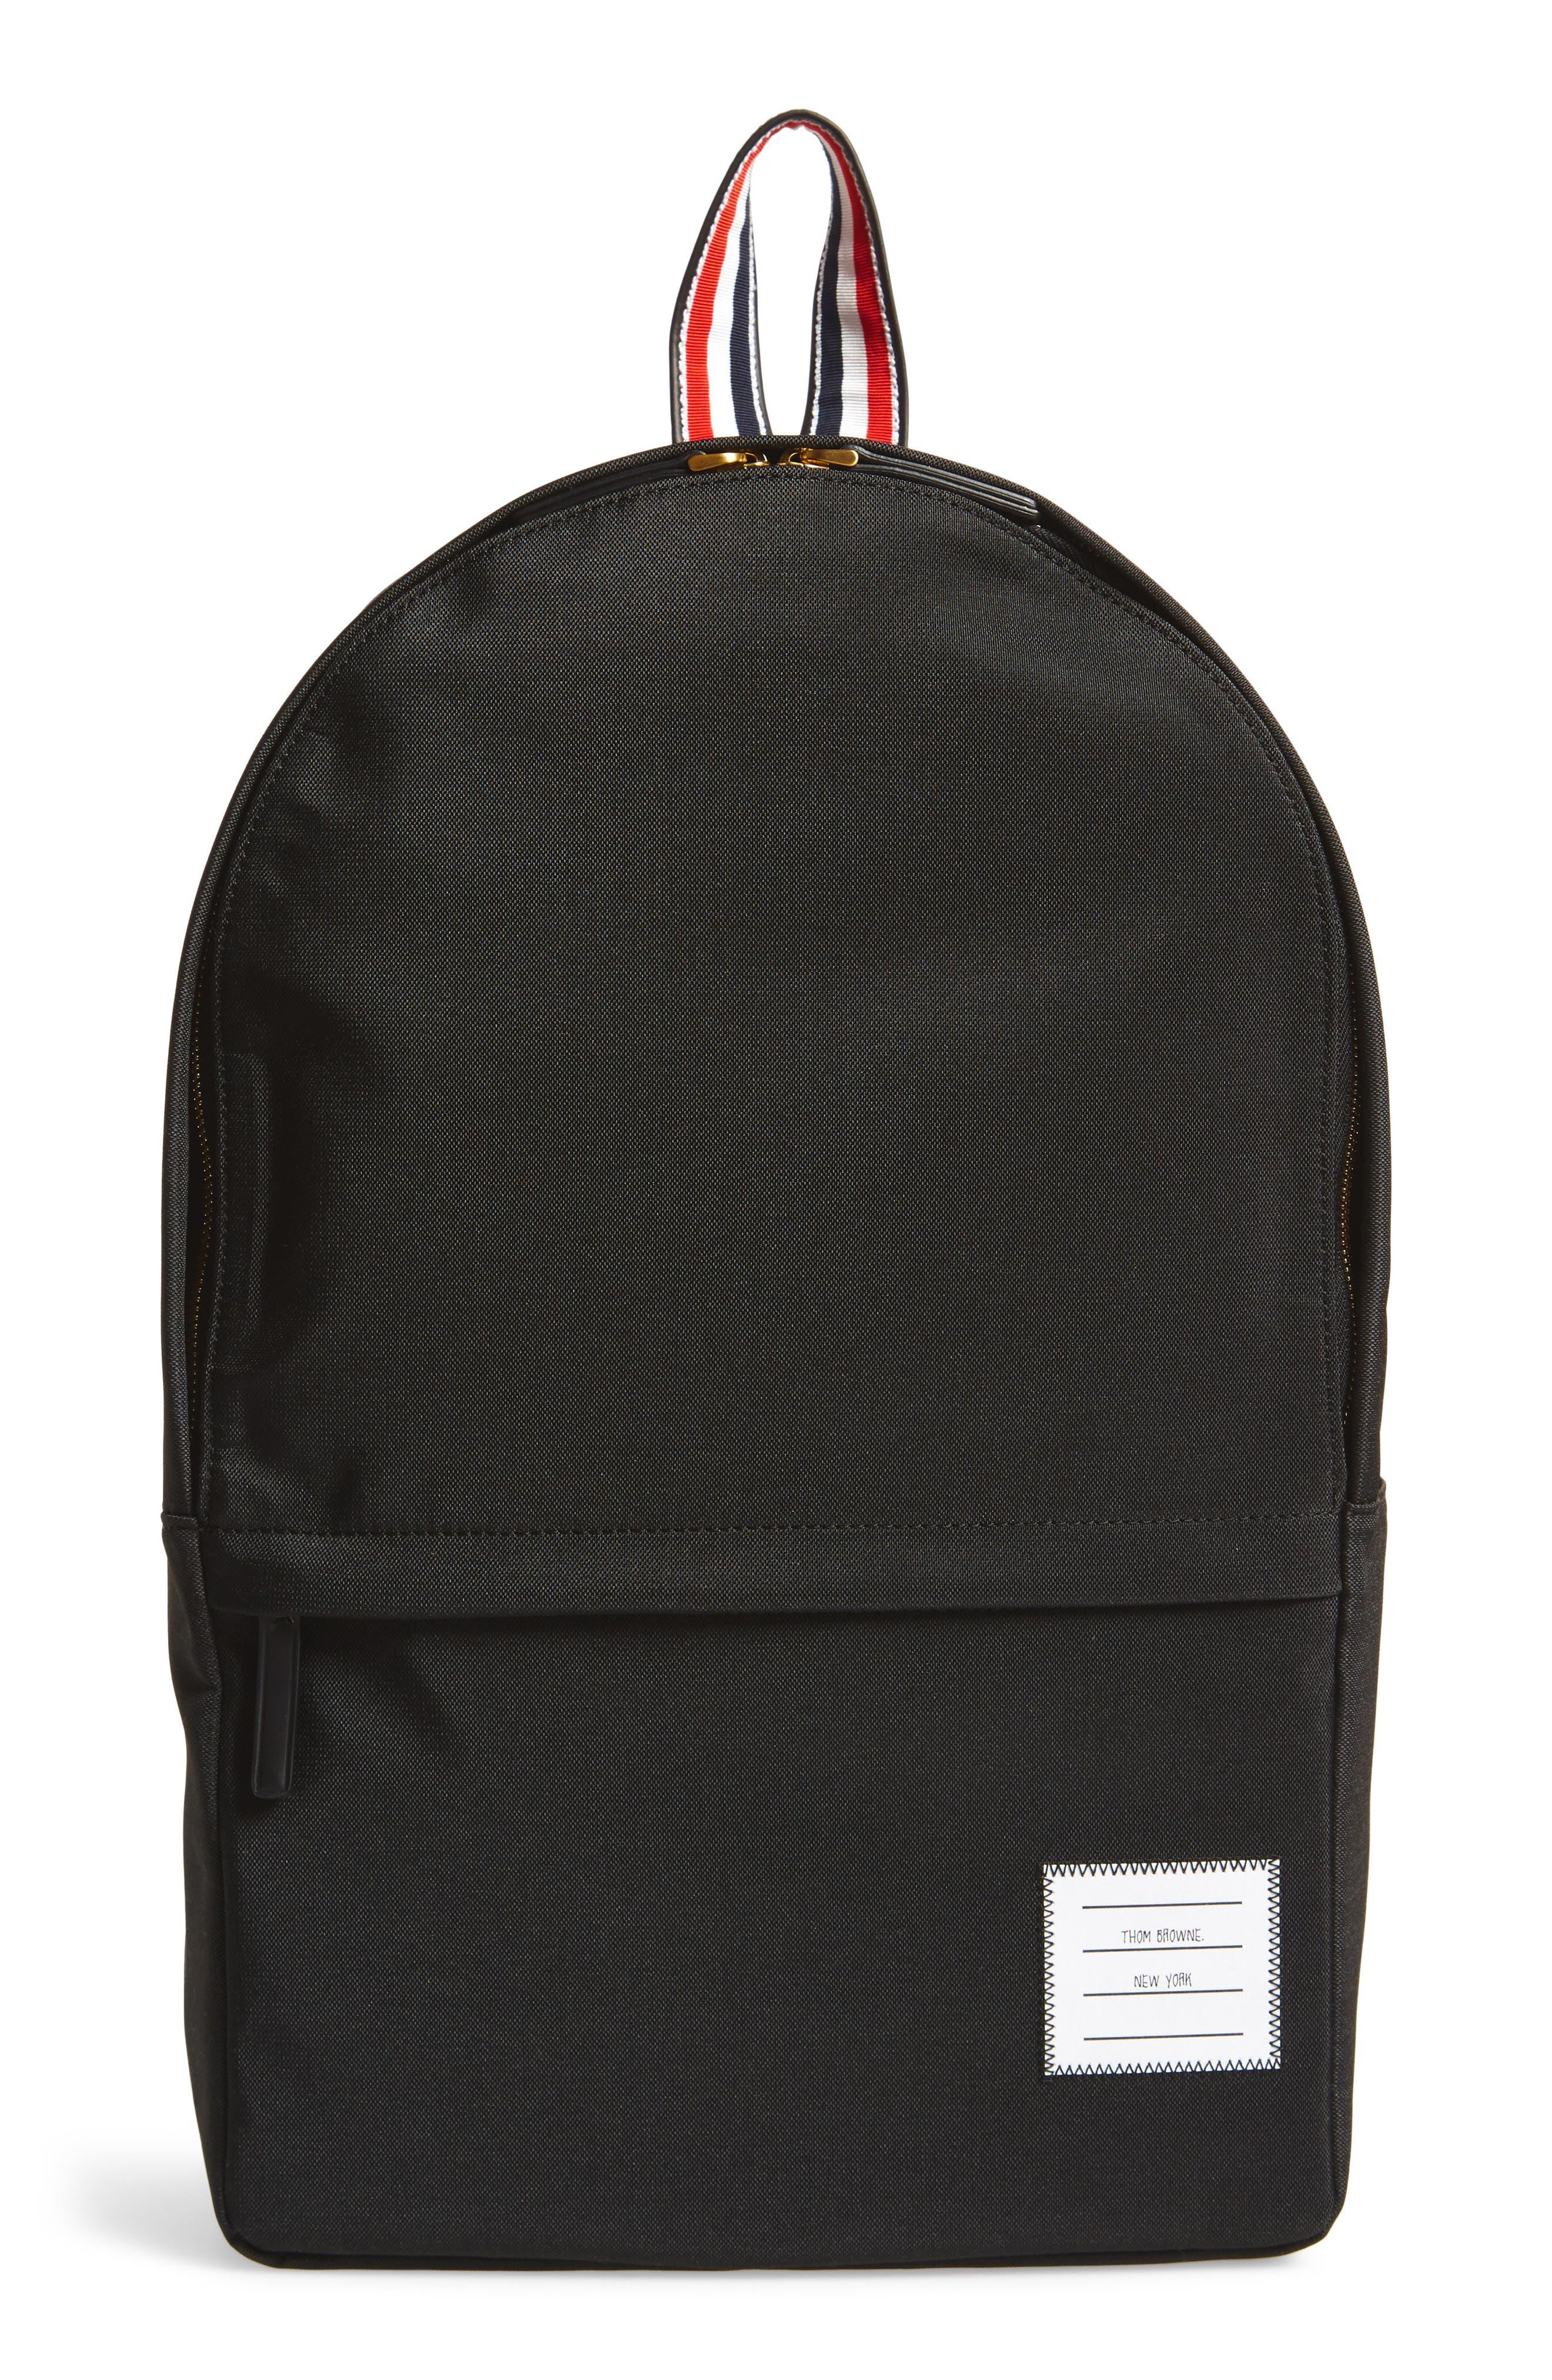 Nylon Backpack,                             Main thumbnail 1, color,                             Black